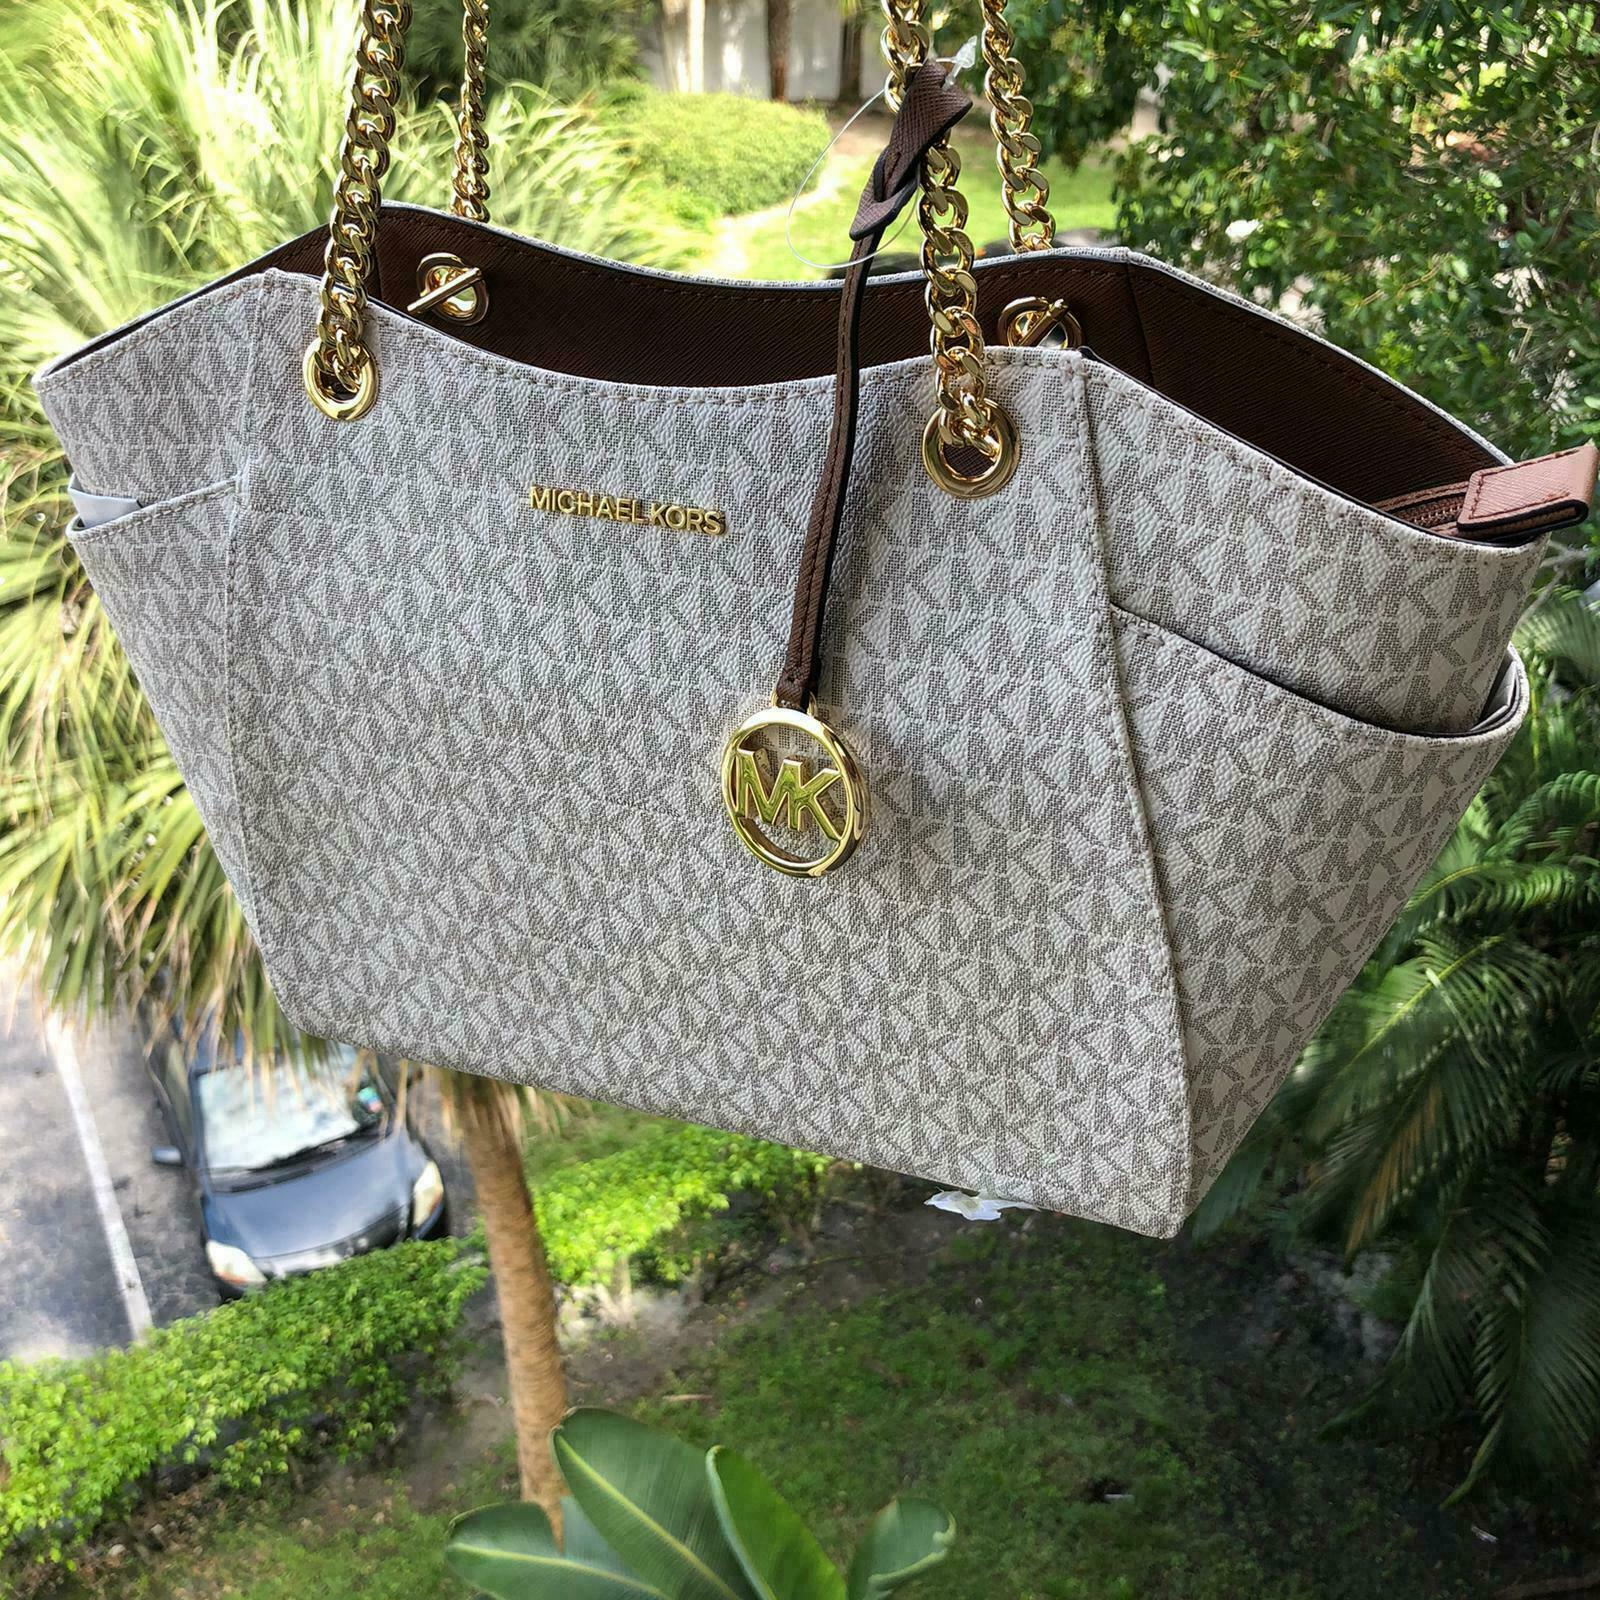 Michael Kors Women Leather Shoulder Tote Handbag Purse Satch